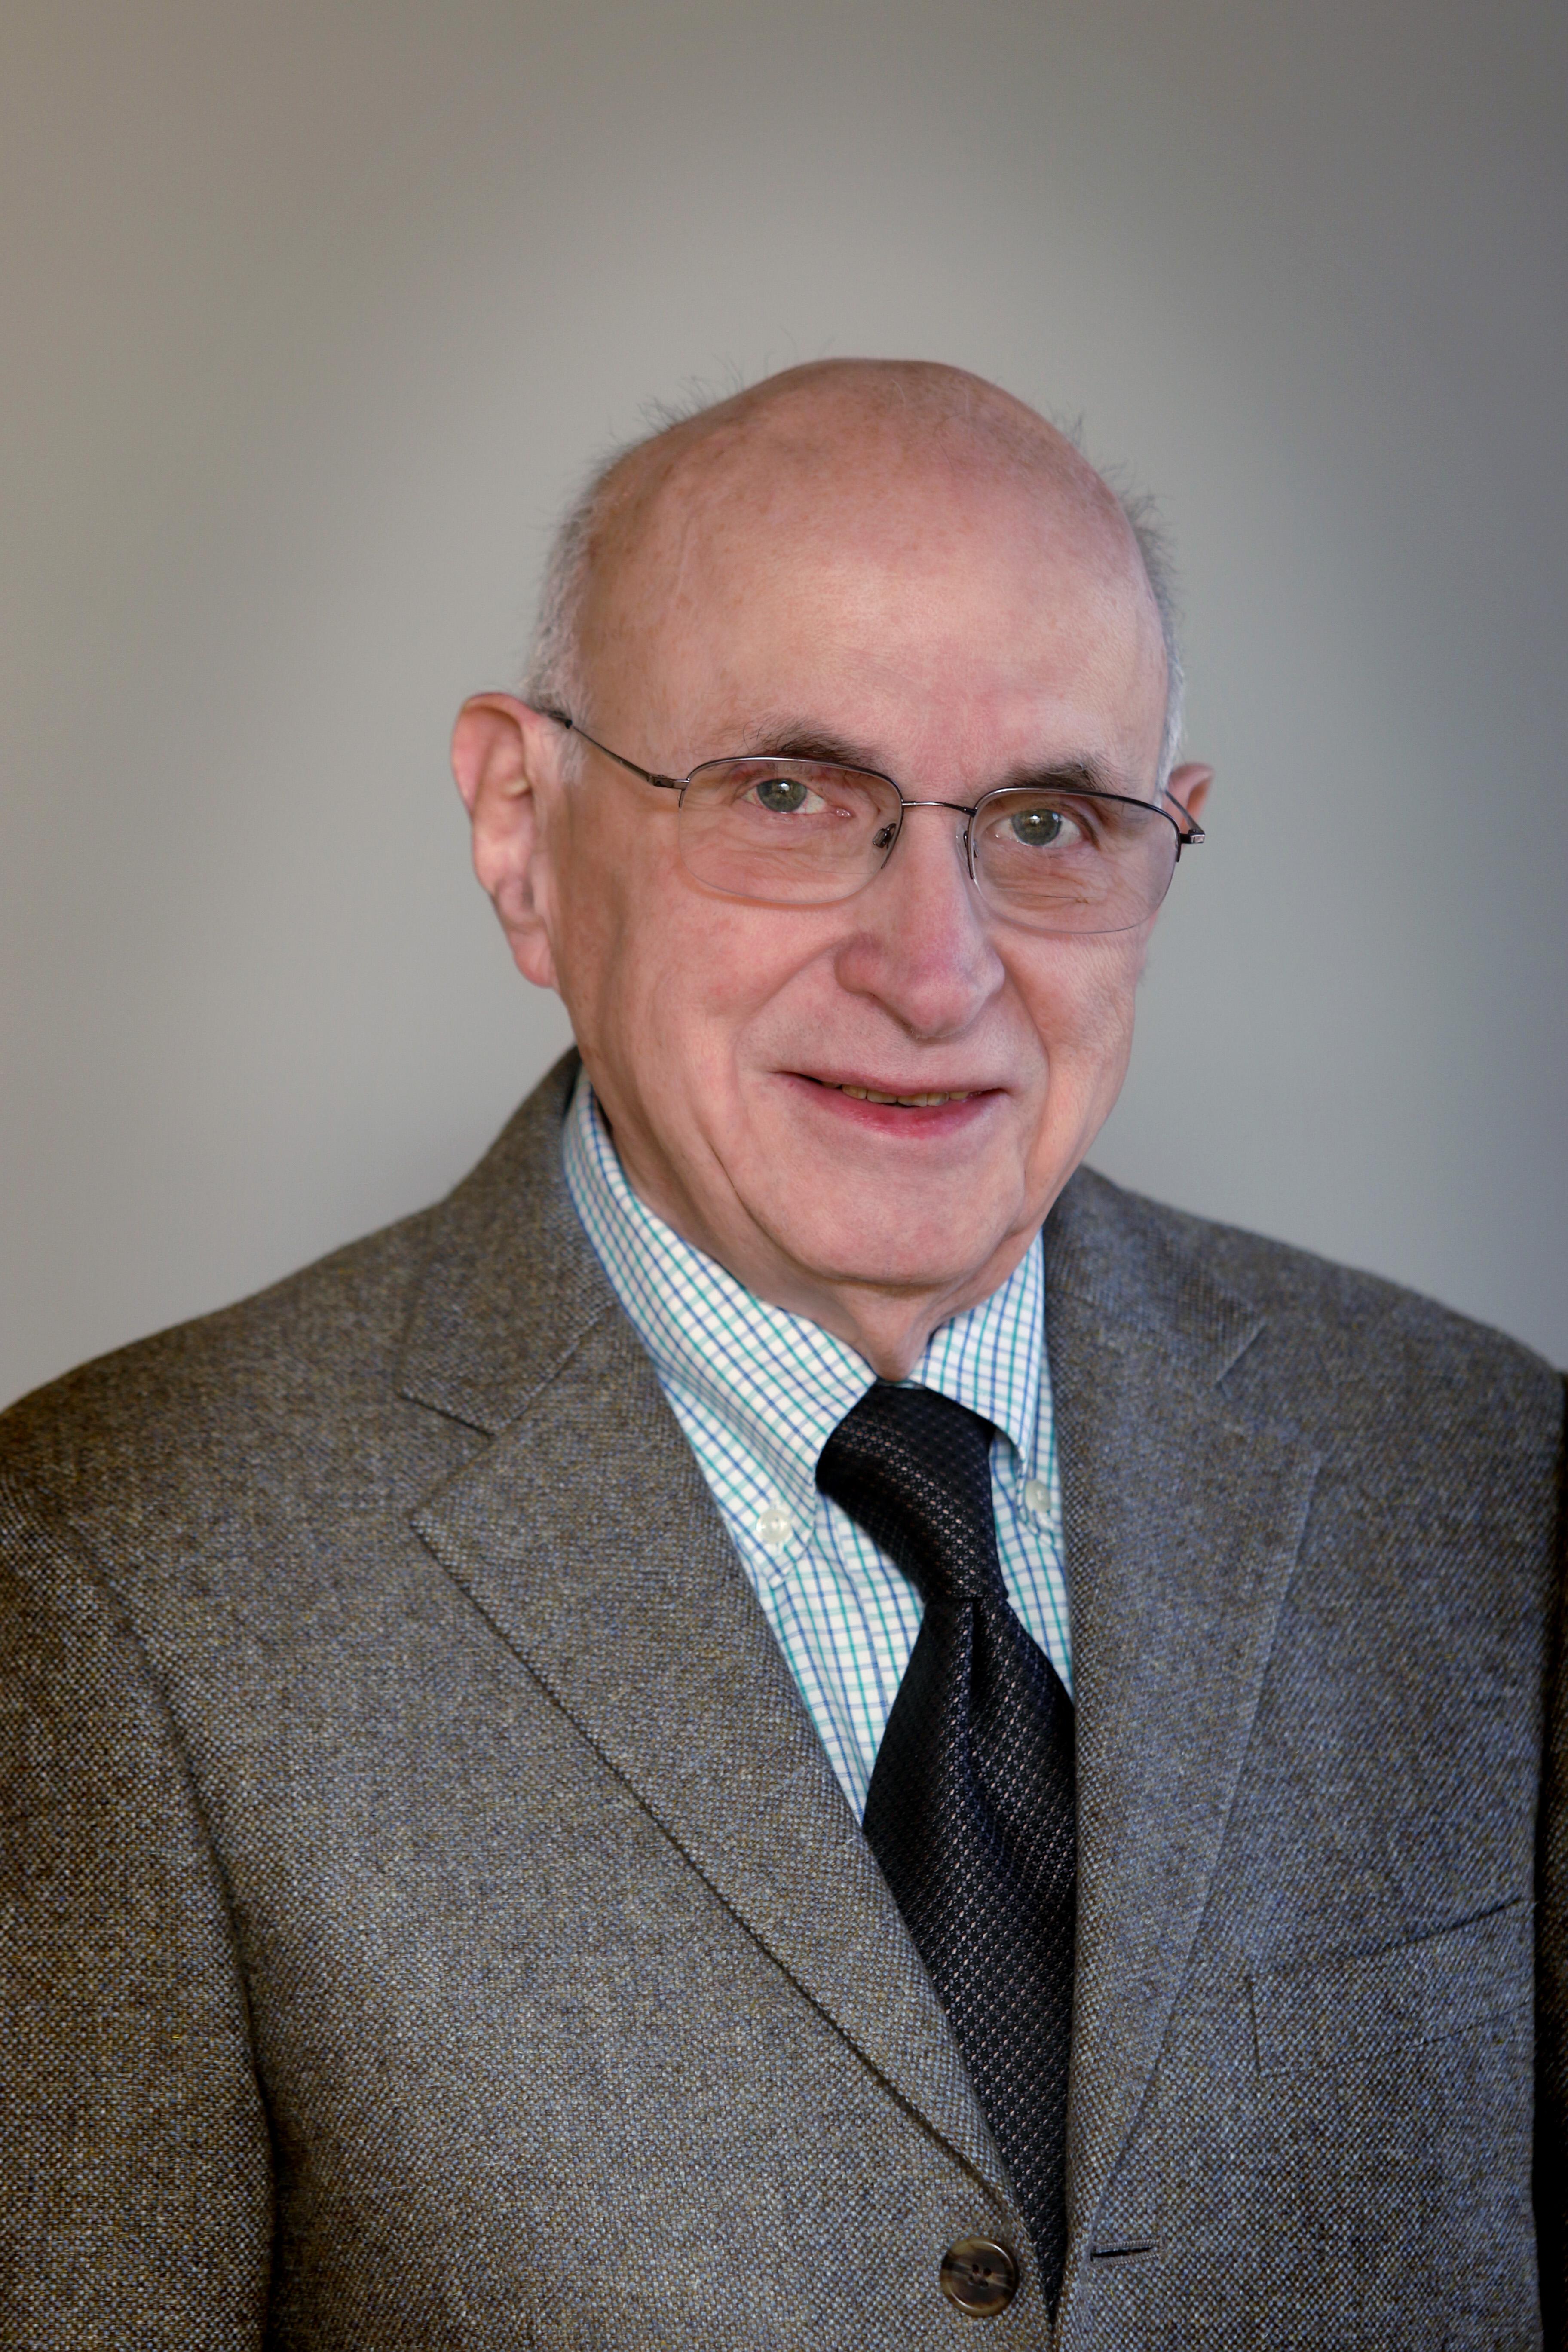 Theodore Oslick, MD, FAARC